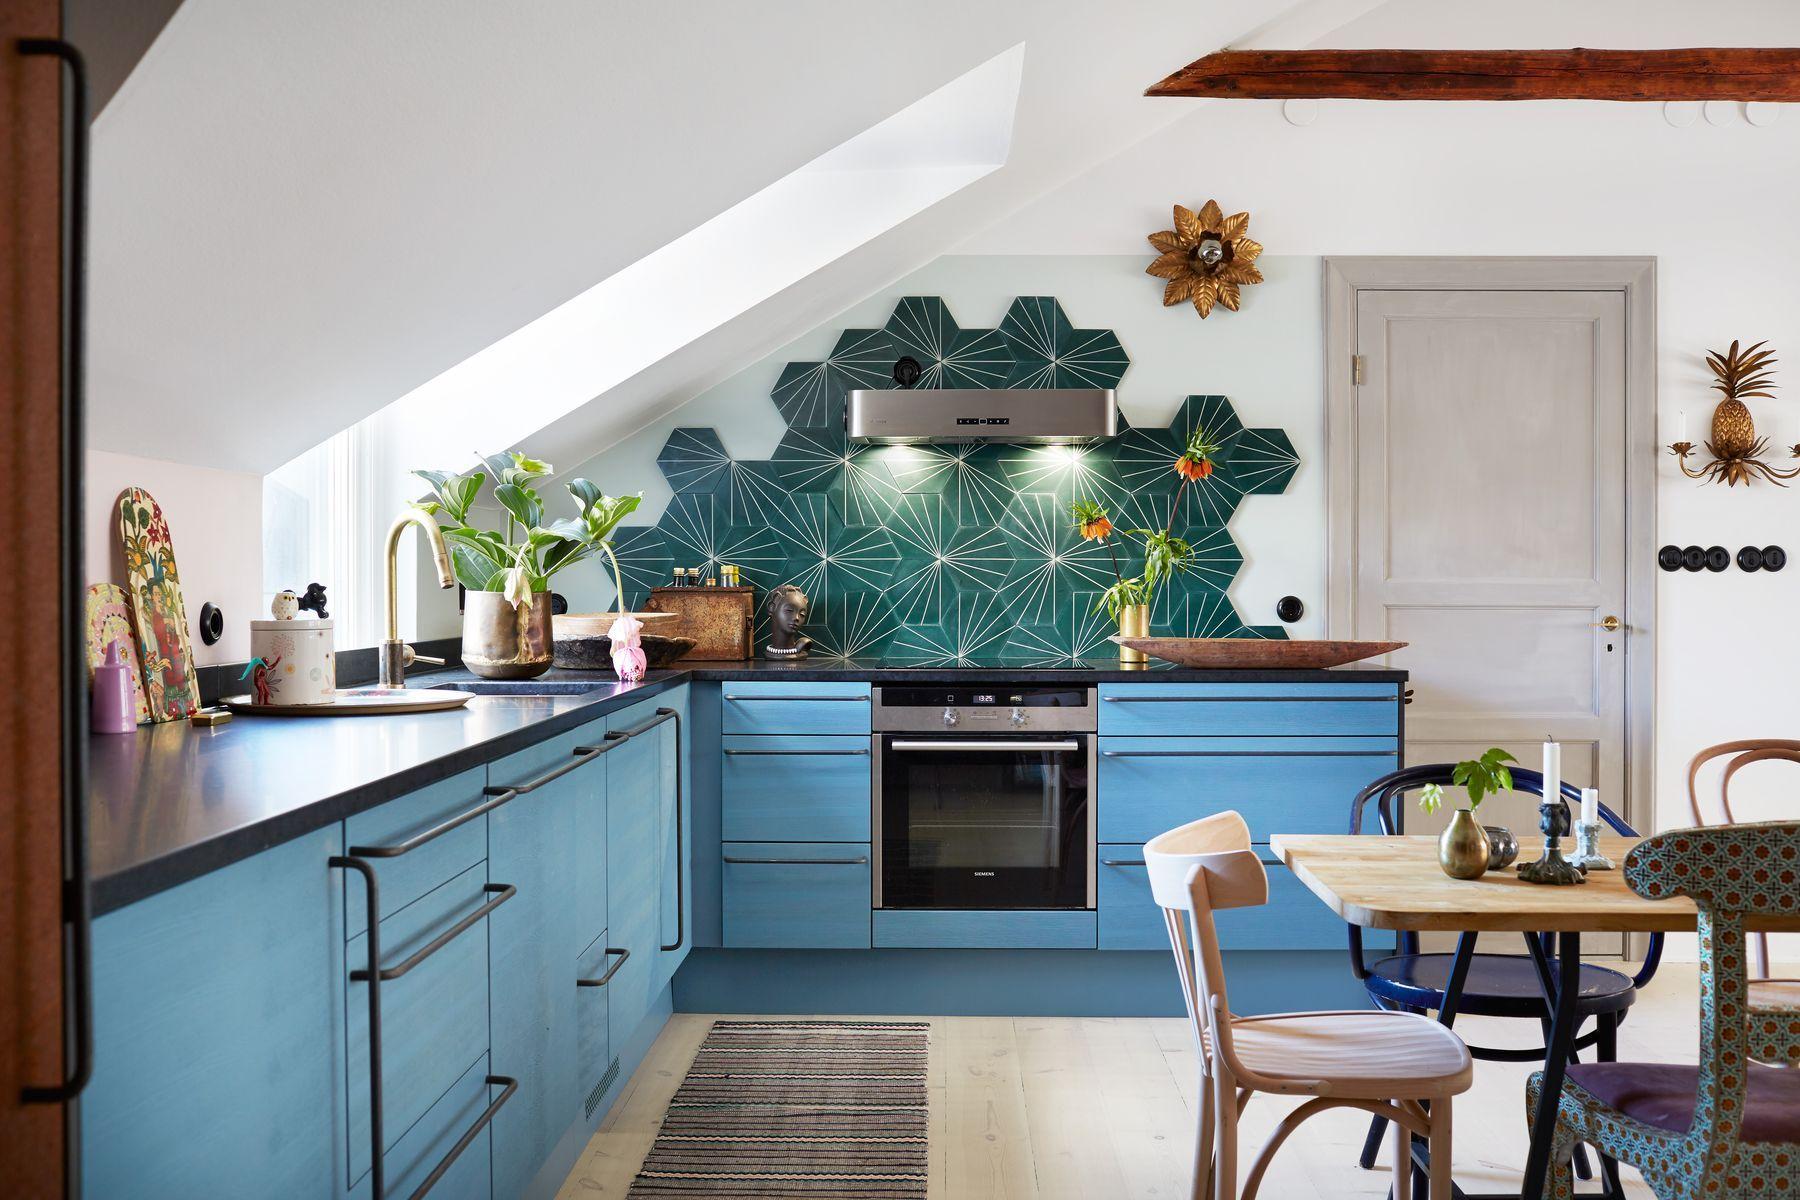 Backsplashes That Take Your Kitchen to the Next Level | Kitchens ...